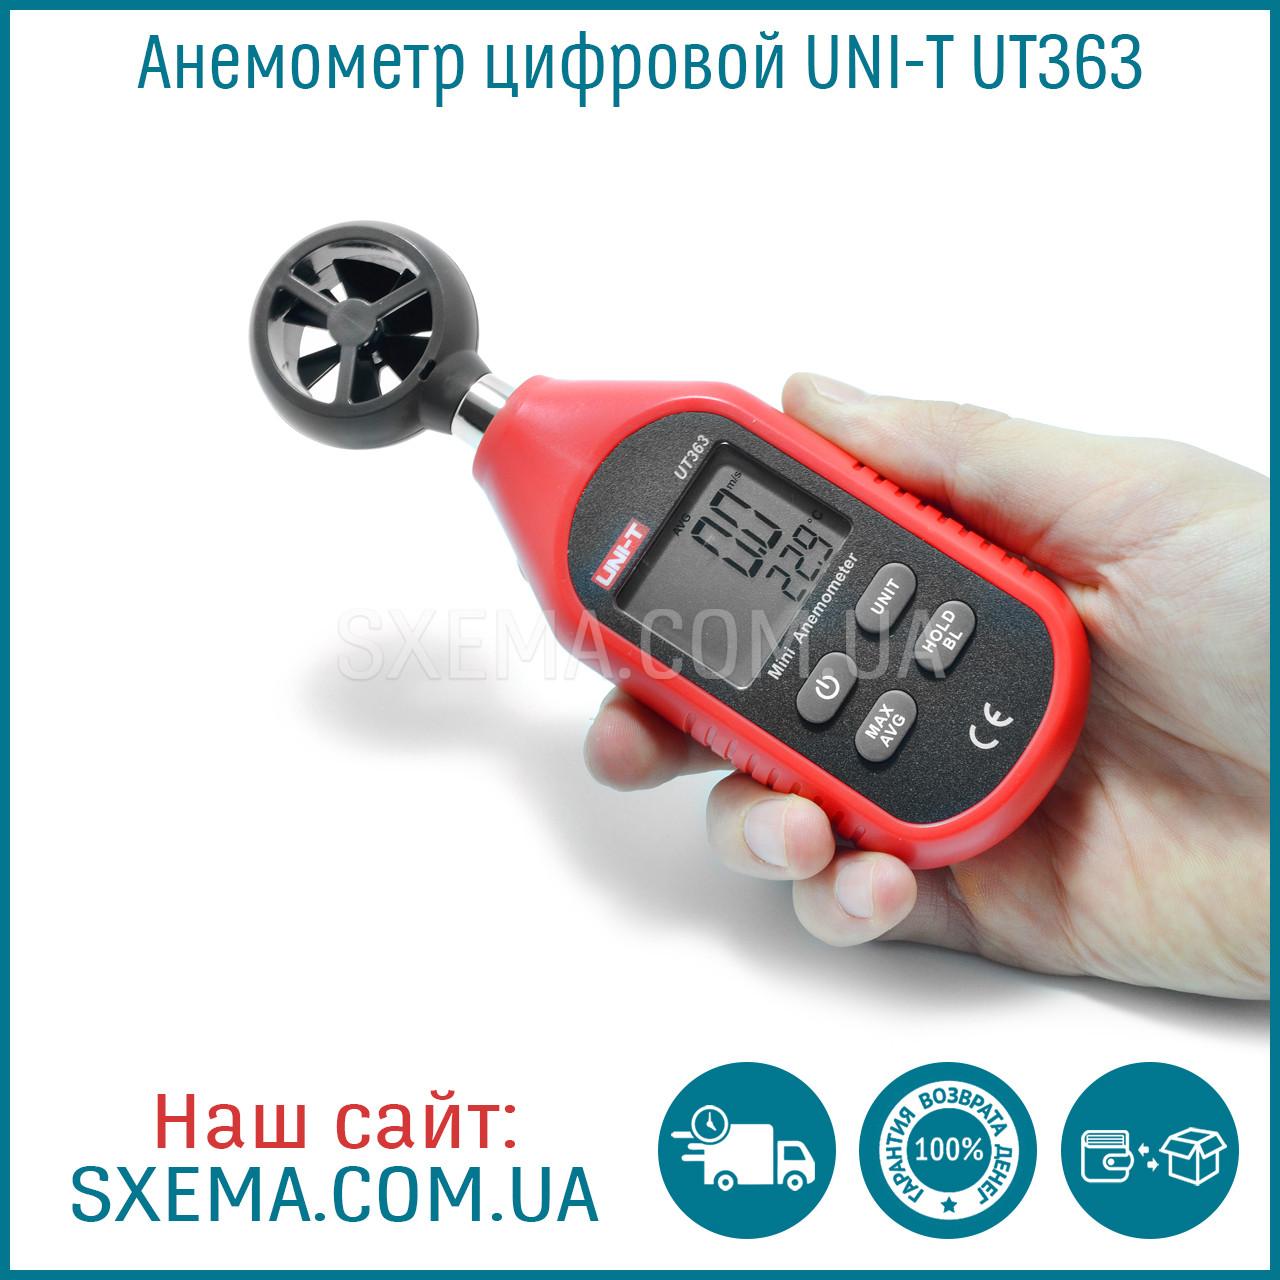 Анемометр цифровой карманный UNI-T UT363